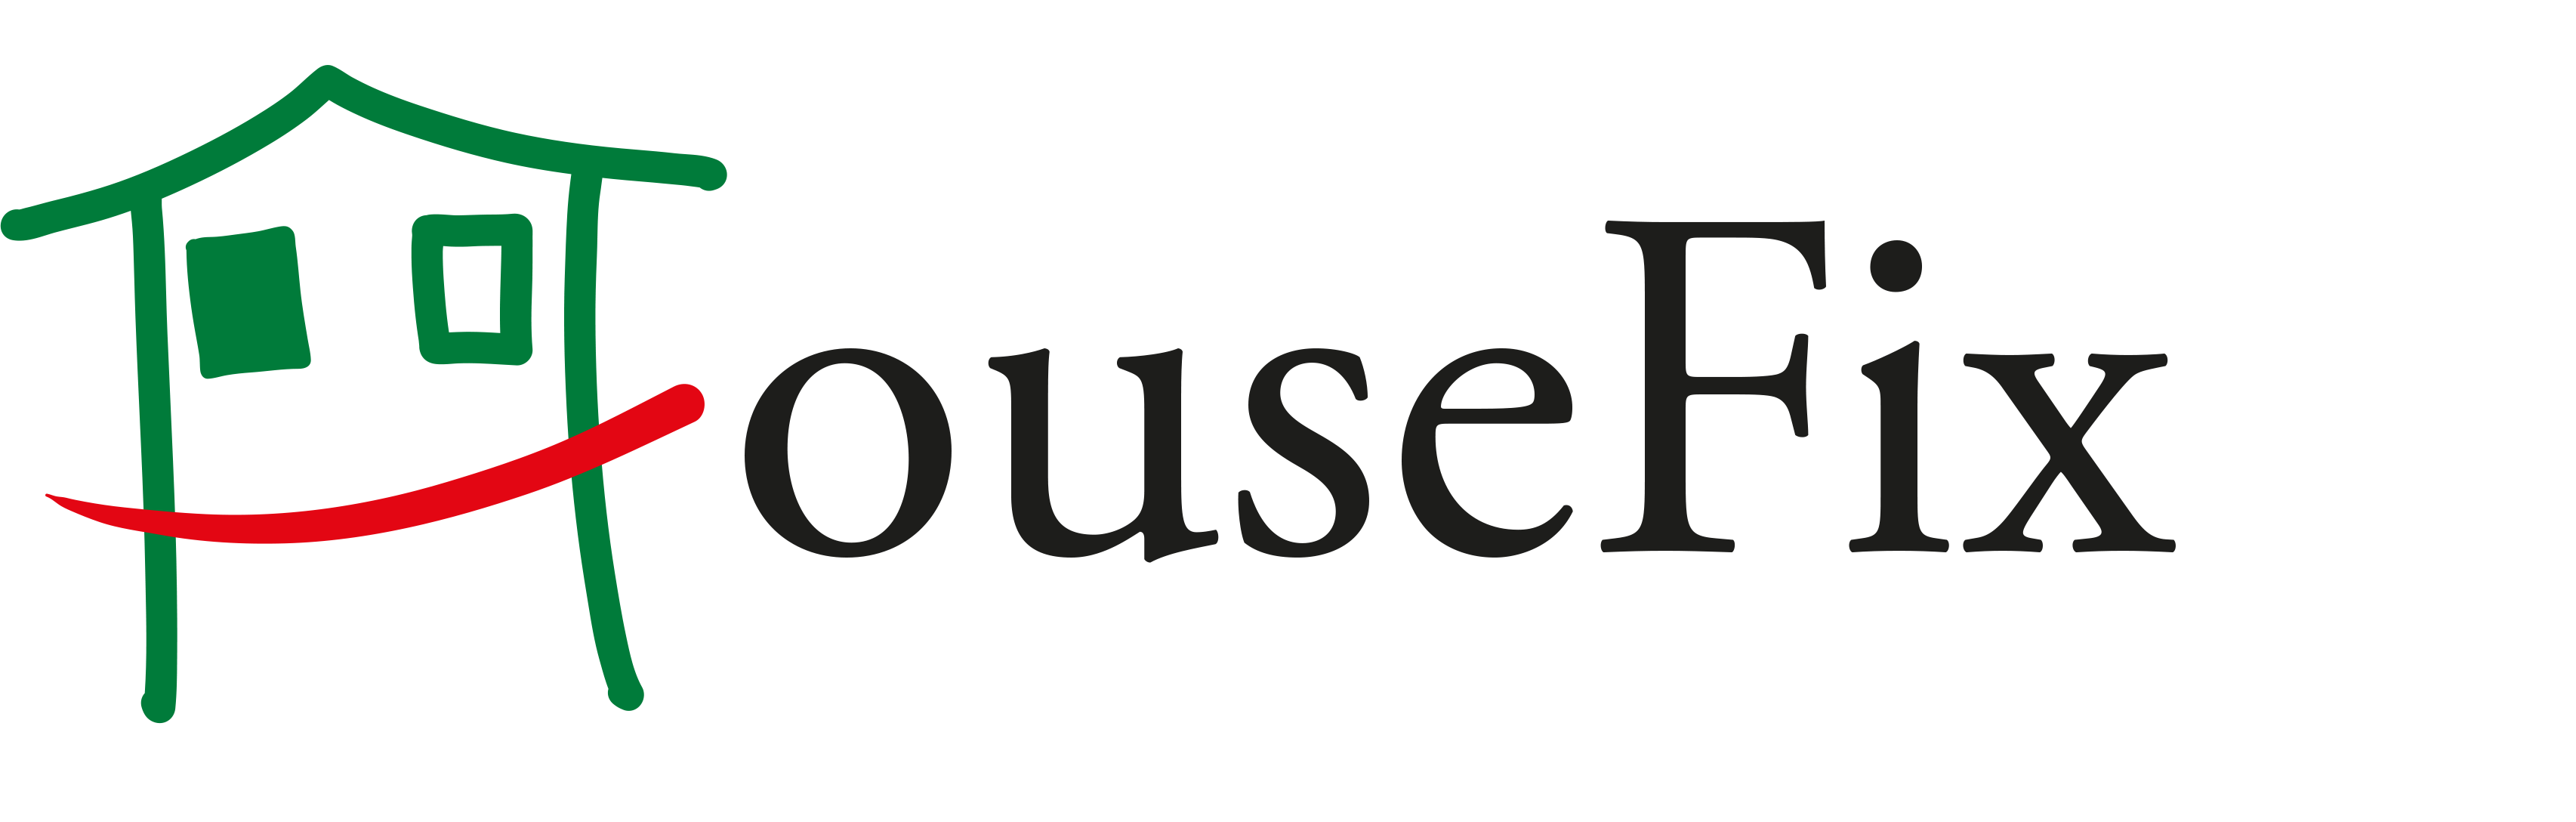 HouseFix klusjesdienst logo